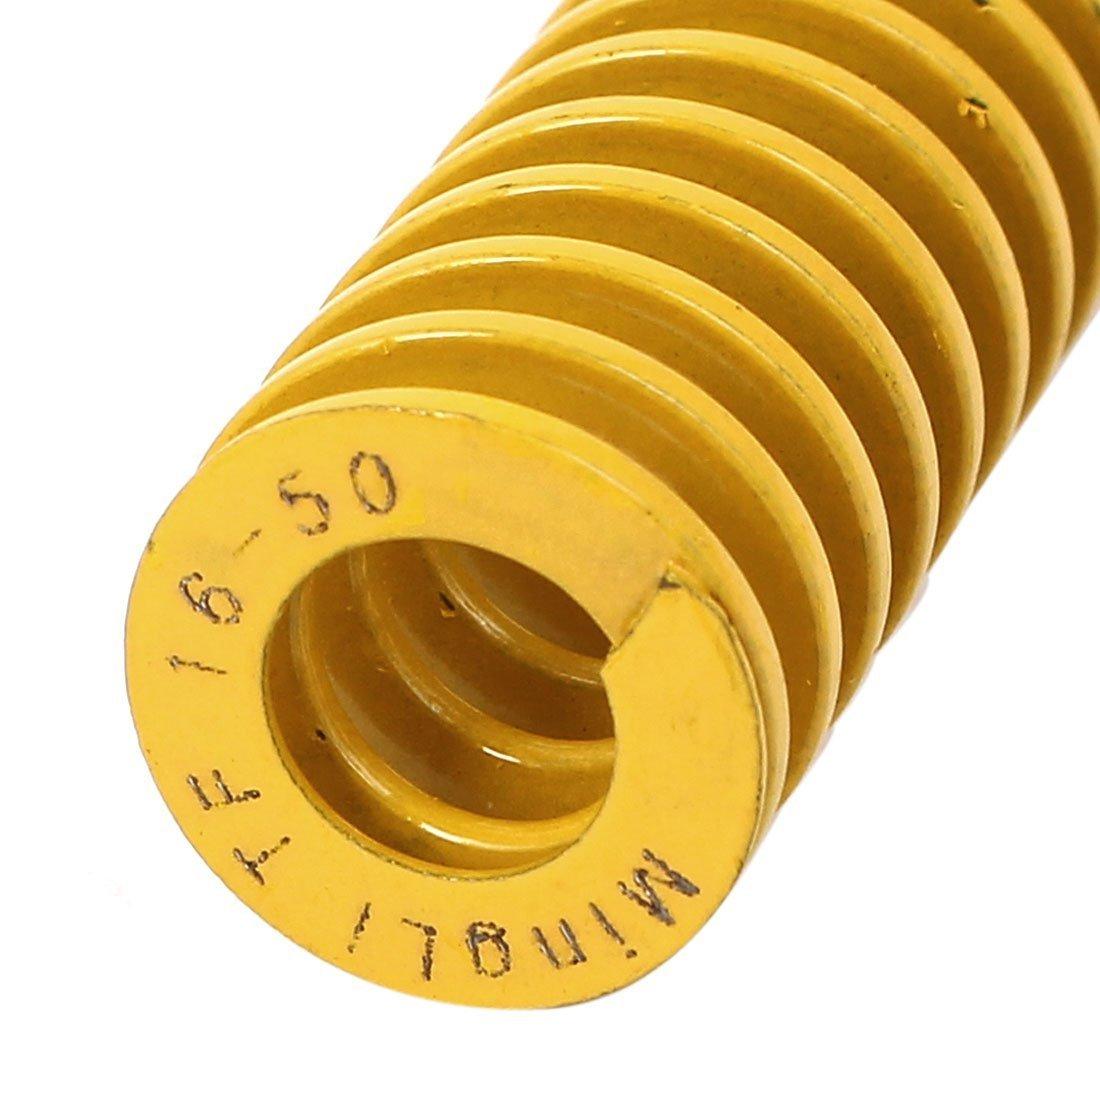 DealMux 16 milímetros x 50mm Tubular Seção de Metal Mold Die compressão Primavera 5 Pcs: Amazon.com: Industrial & Scientific